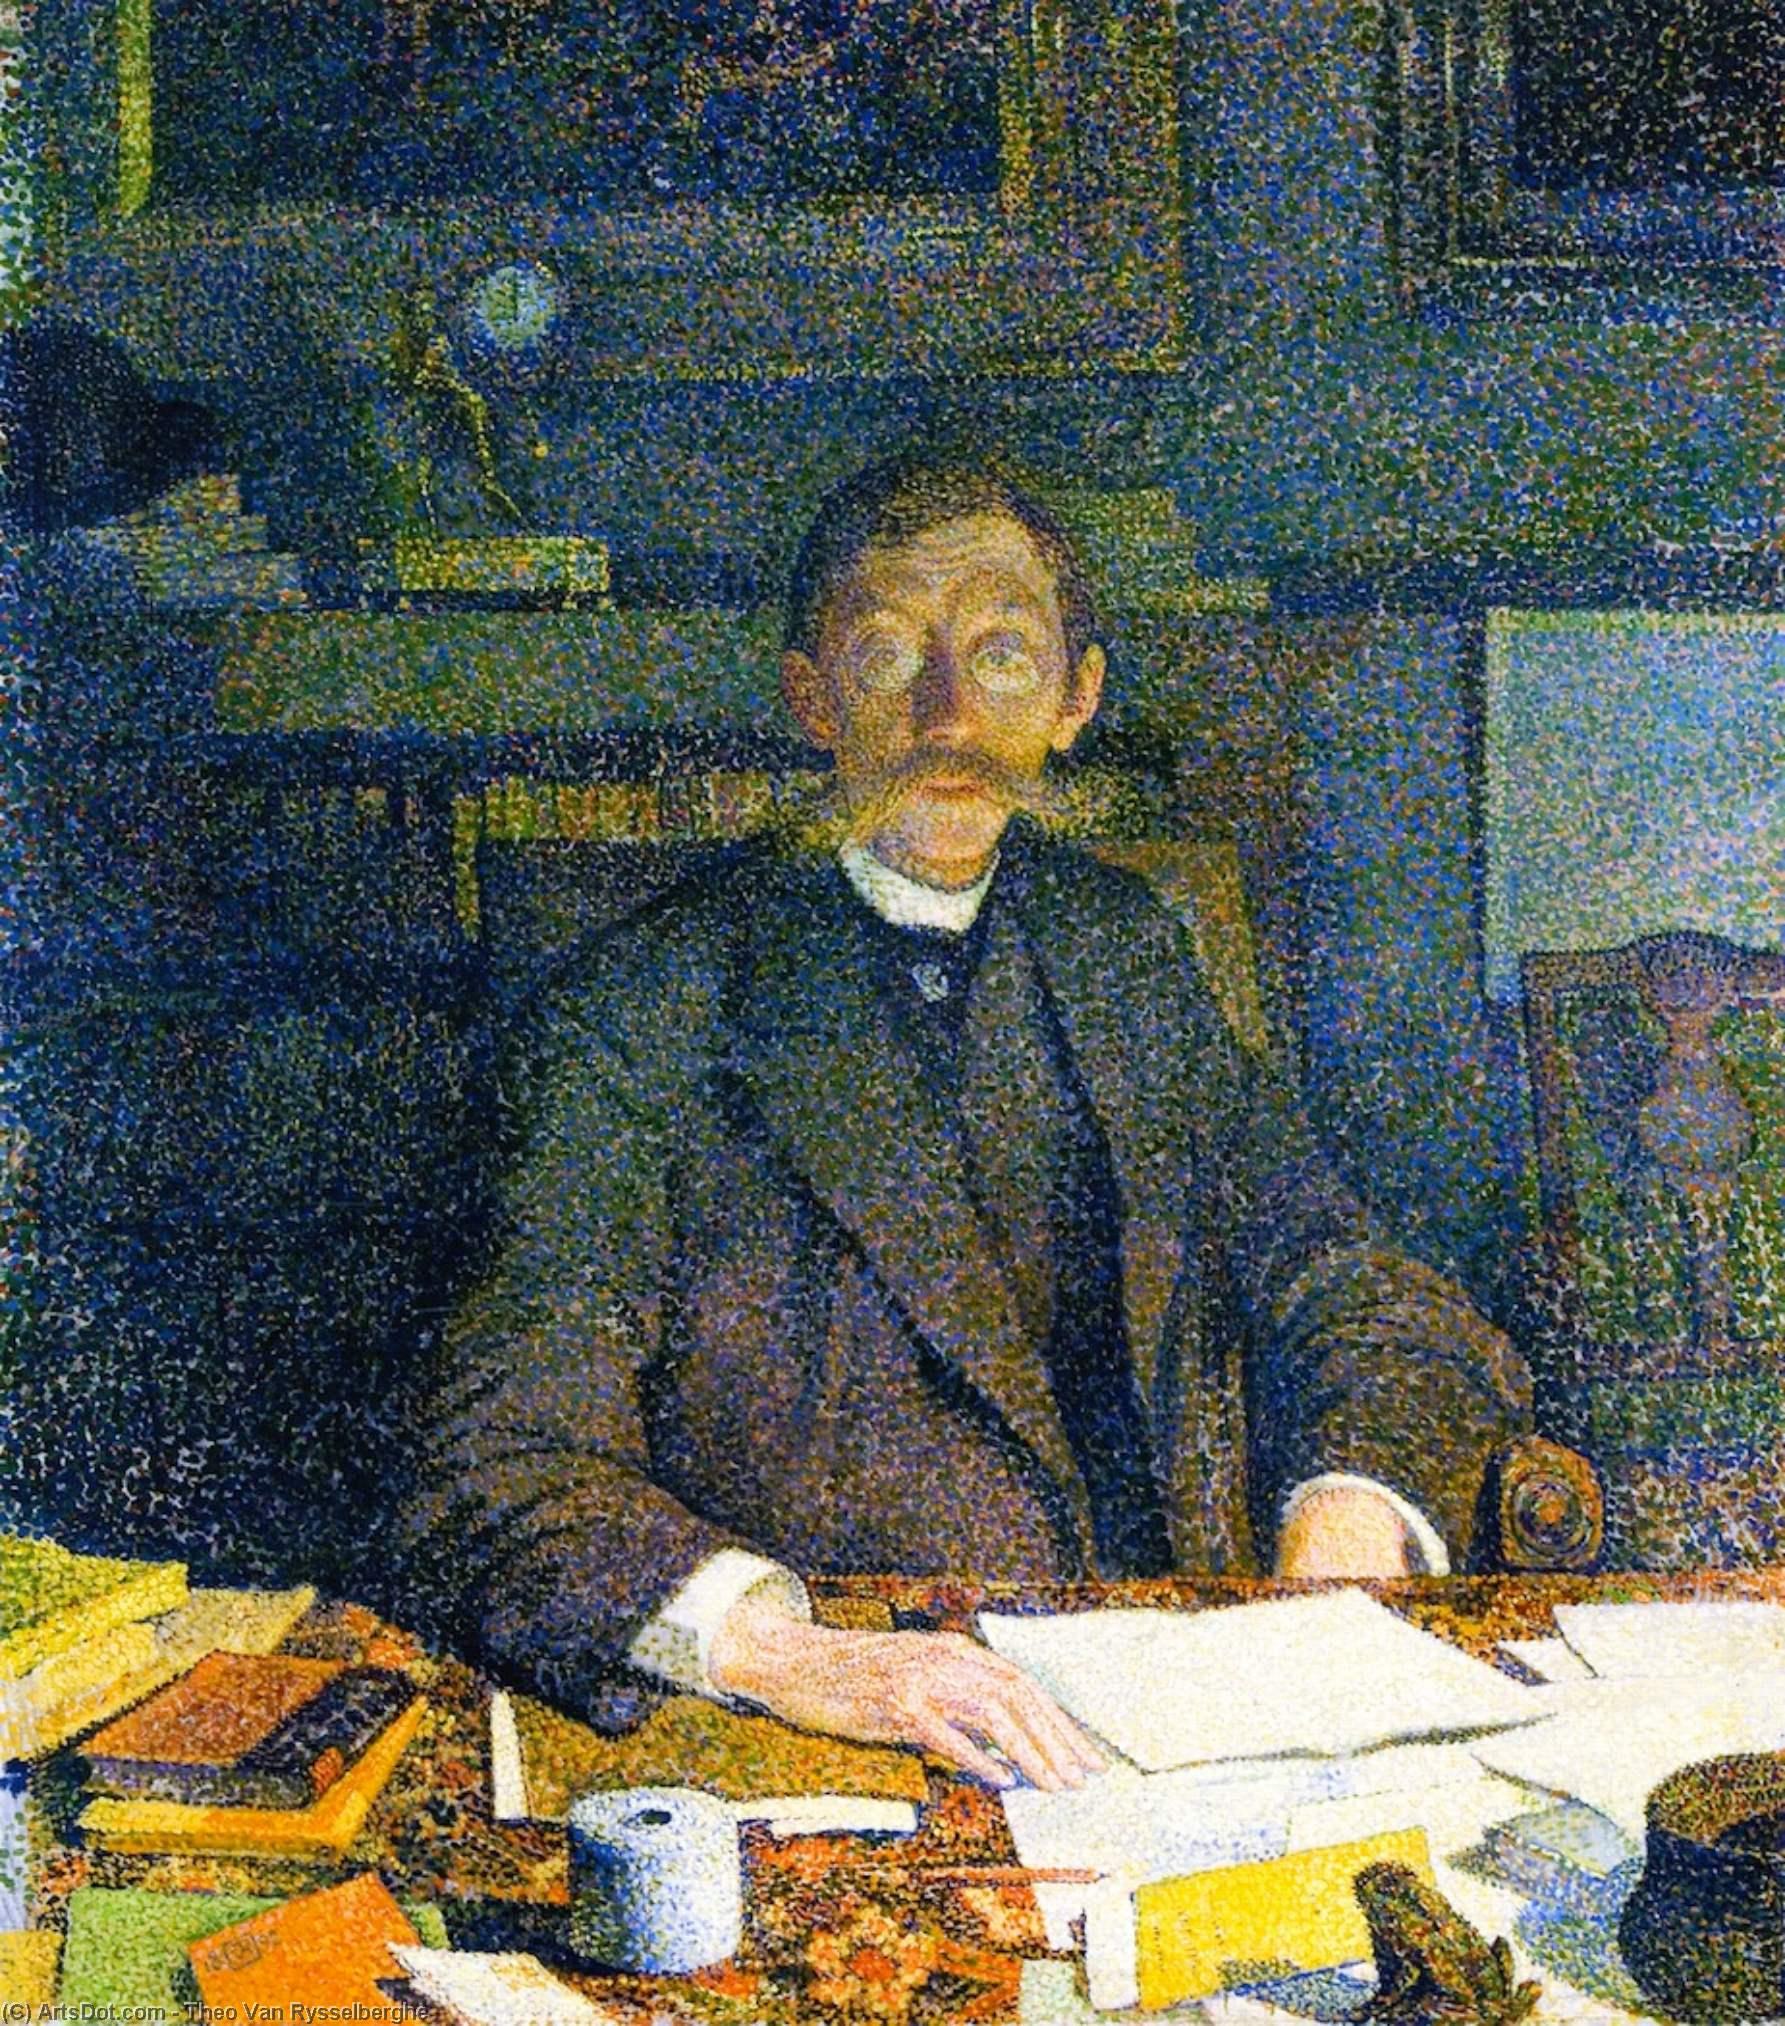 Wikoo.org - موسوعة الفنون الجميلة - اللوحة، العمل الفني Theo Van Rysselberghe - Emile Verhaeren in His Stody (rue du Moulin)